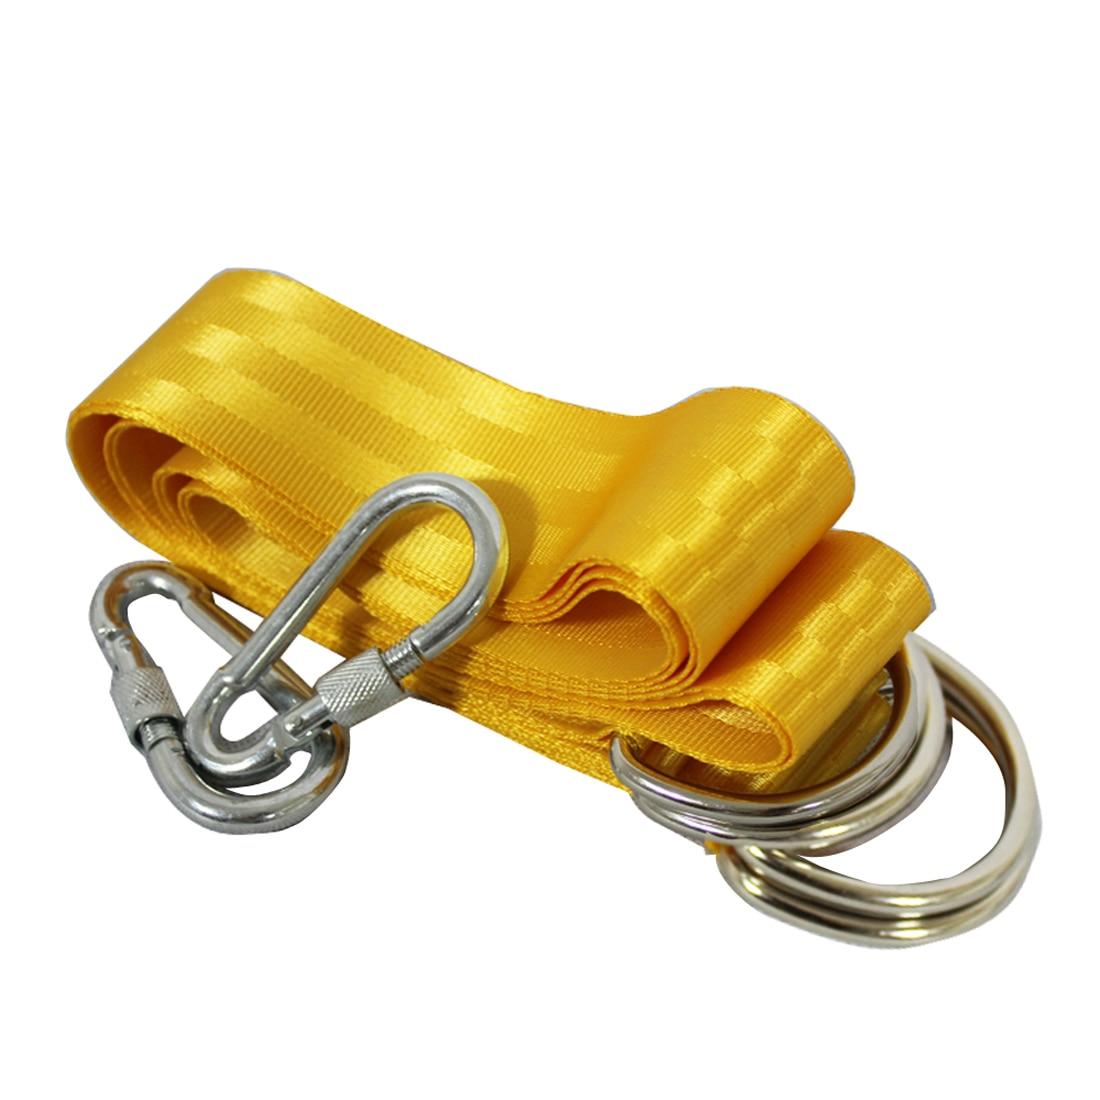 2 x Rope Lock Tie Strength Polyester Webbing Straps Safe Ropes Outdoor Swing Straps Hammock Straps Load 300KG Golden 5*150CM